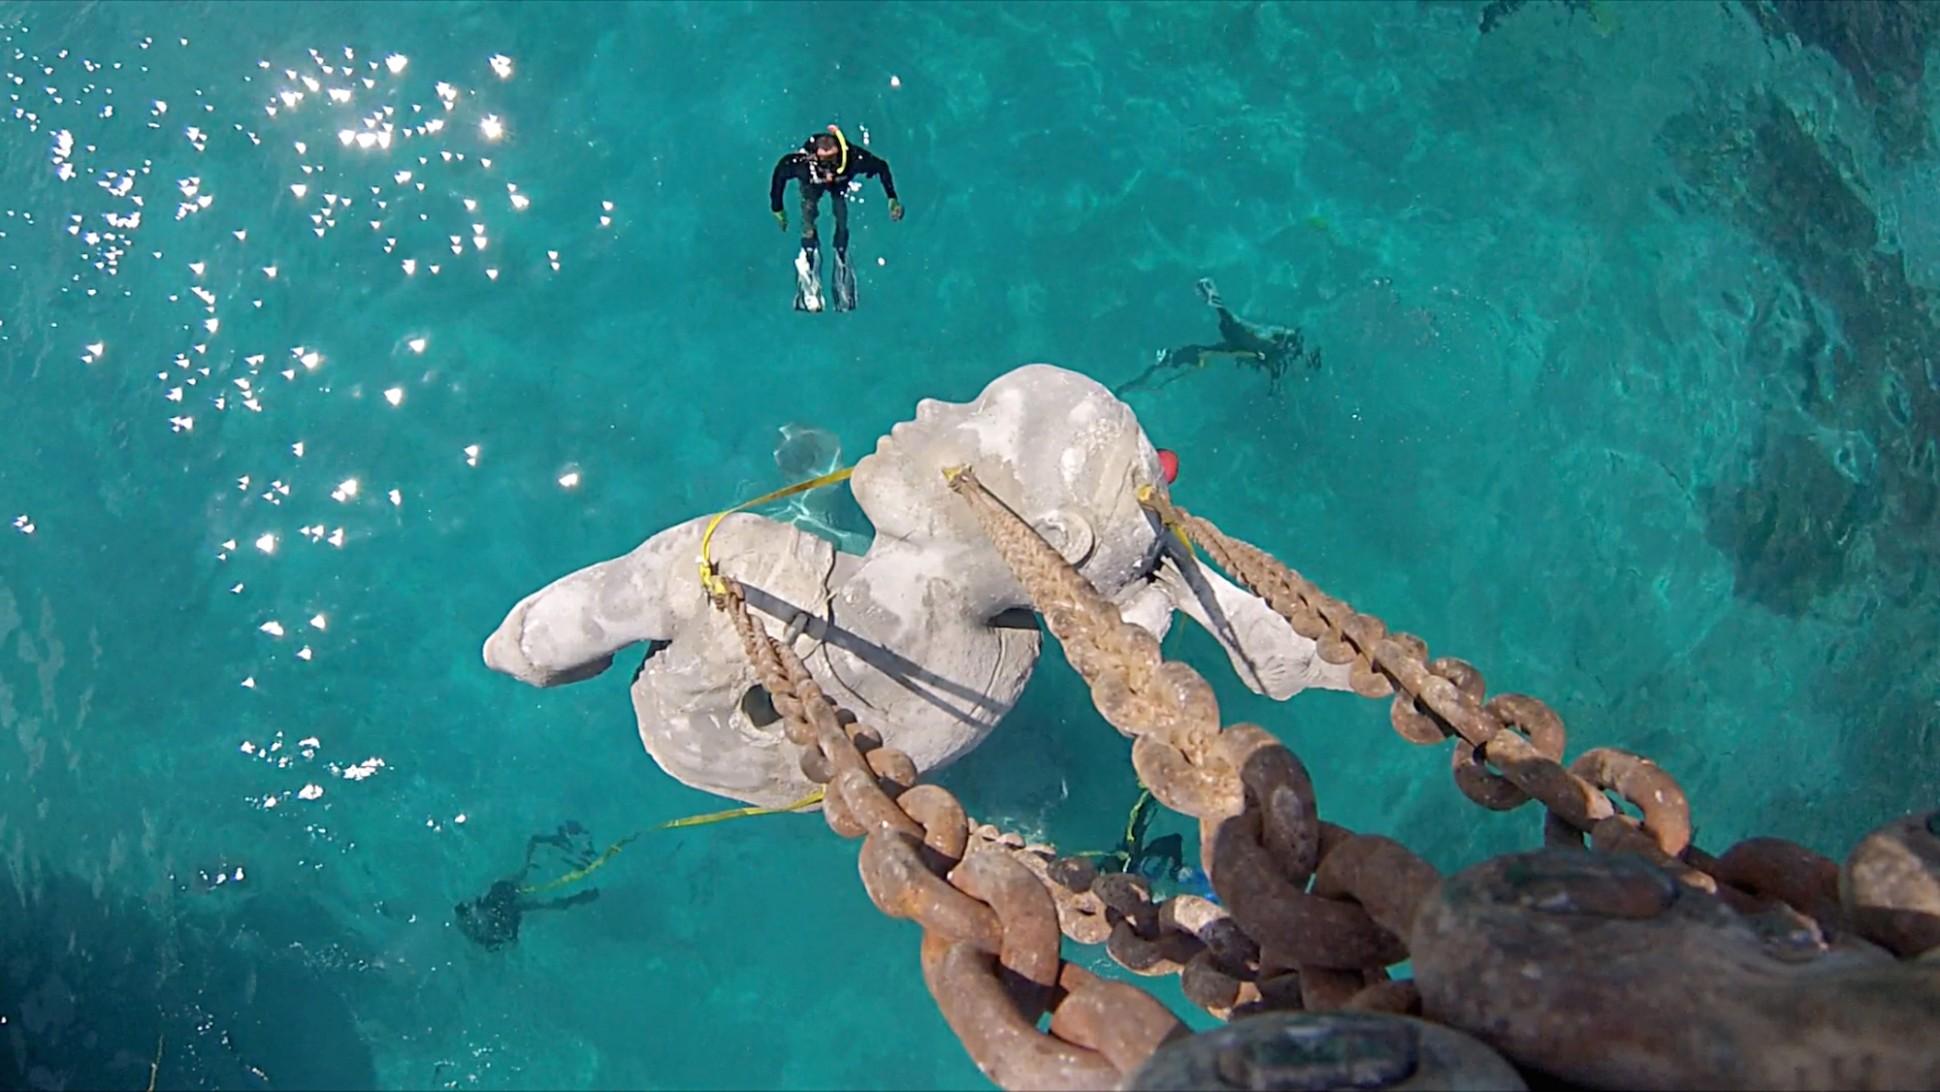 galerie subacvatica Jason deCaires Taylor